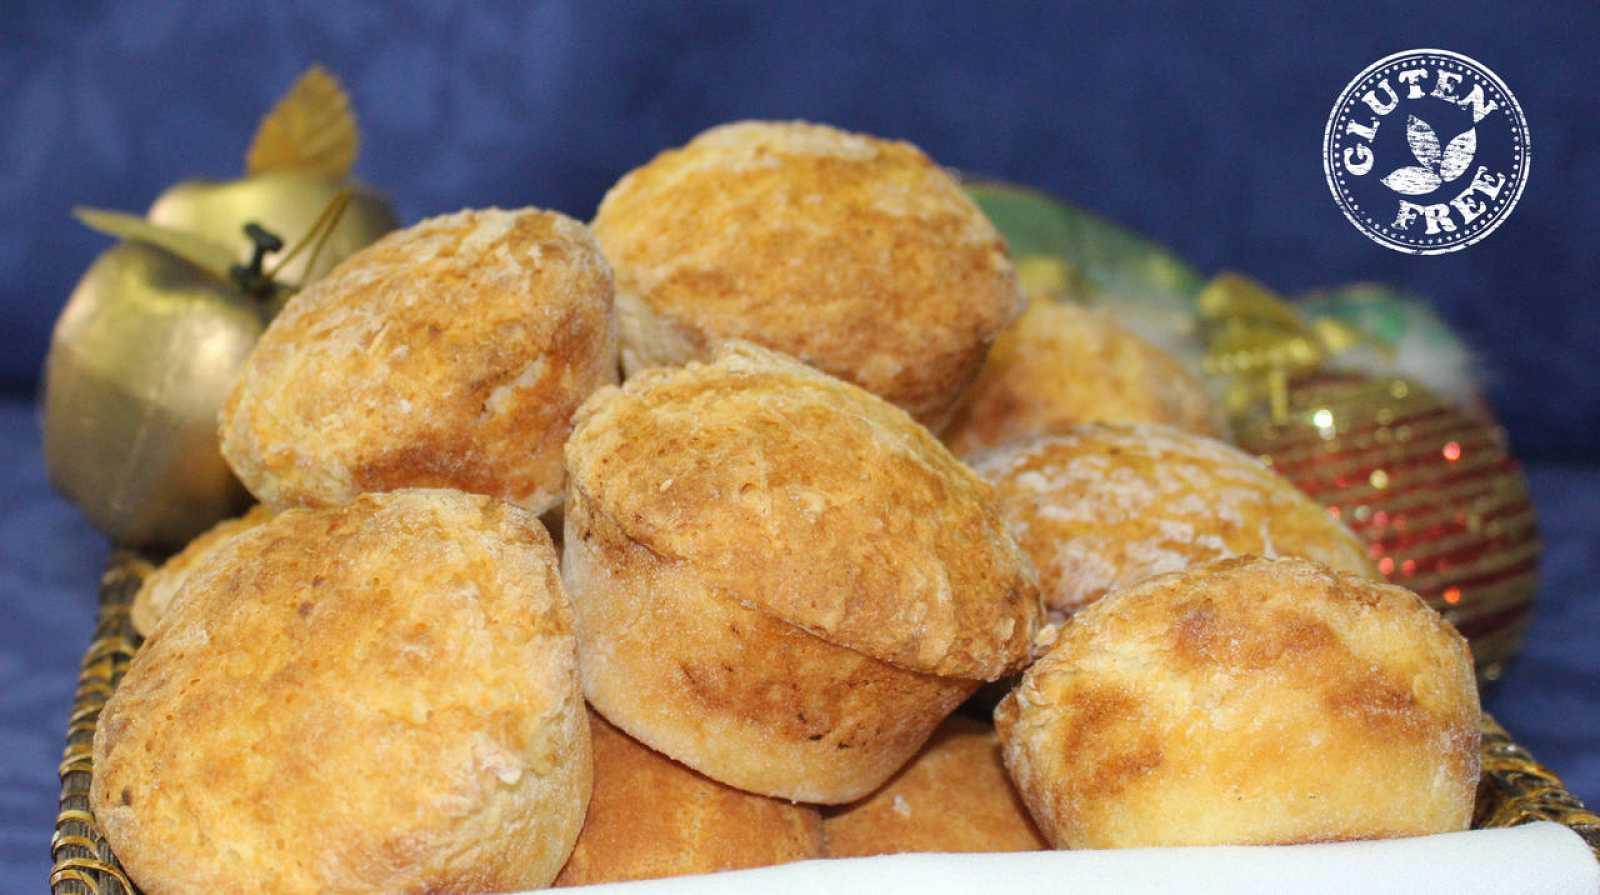 Menú de Navidad para celiacos: Pan de mandioca para celiacos